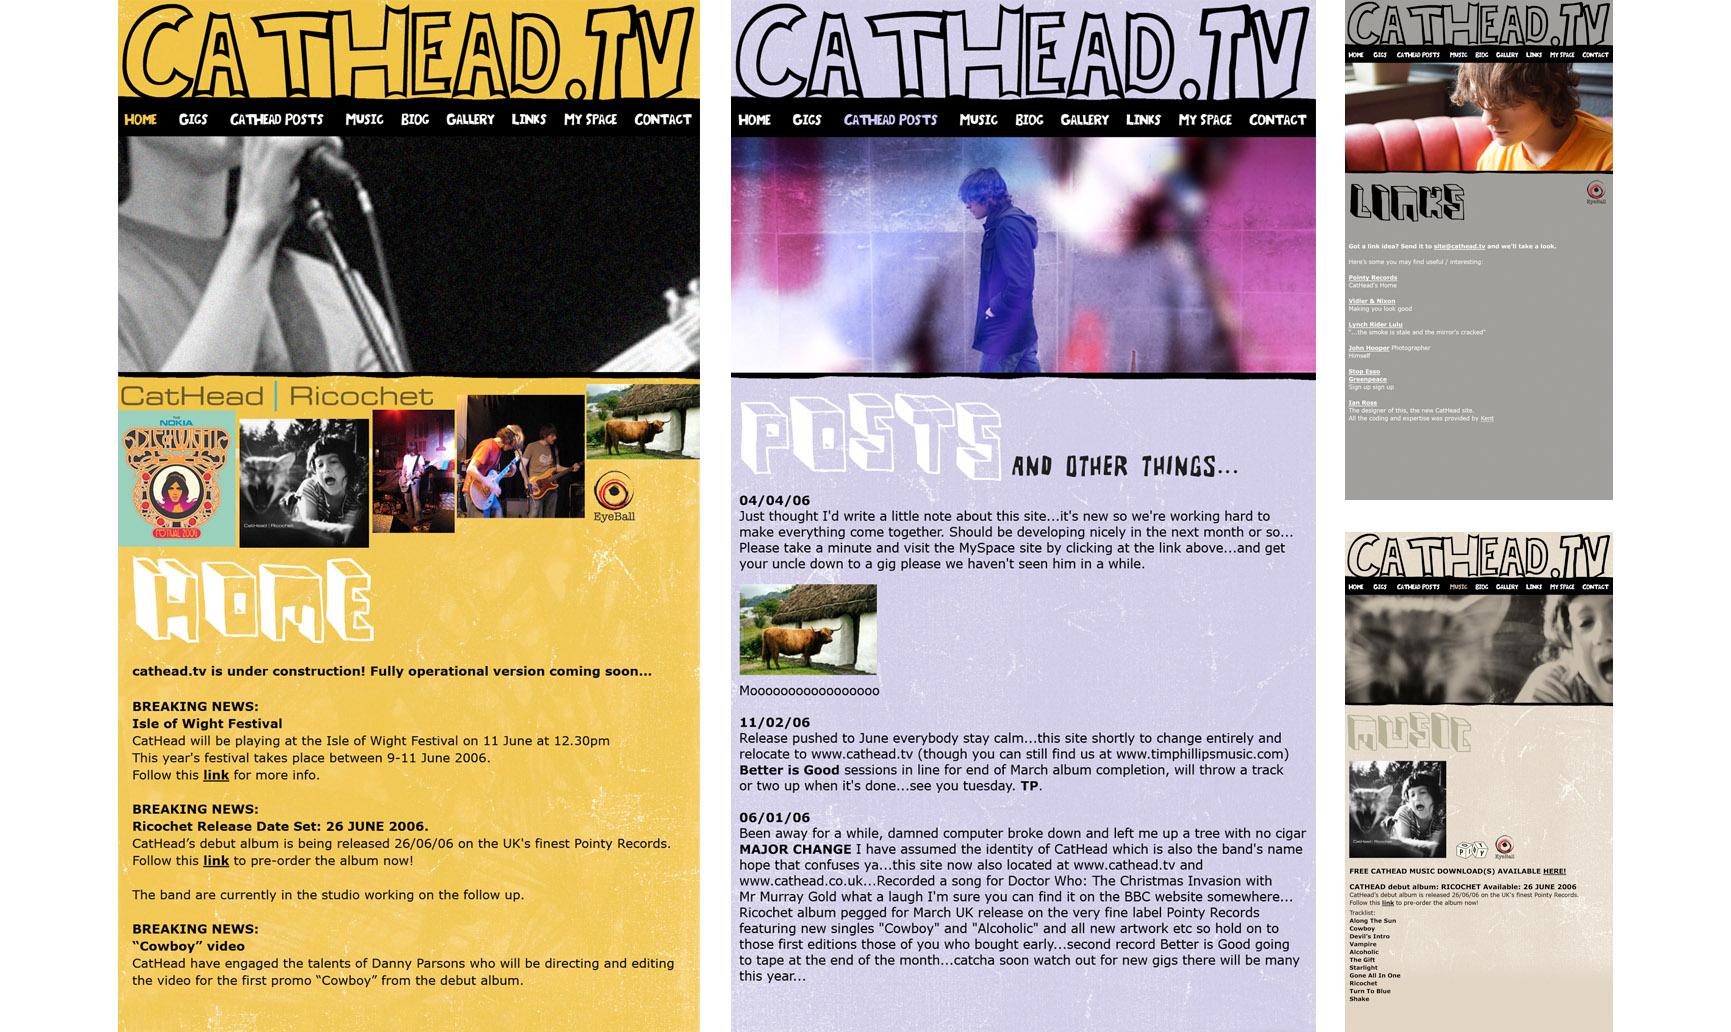 CatHeadWeb